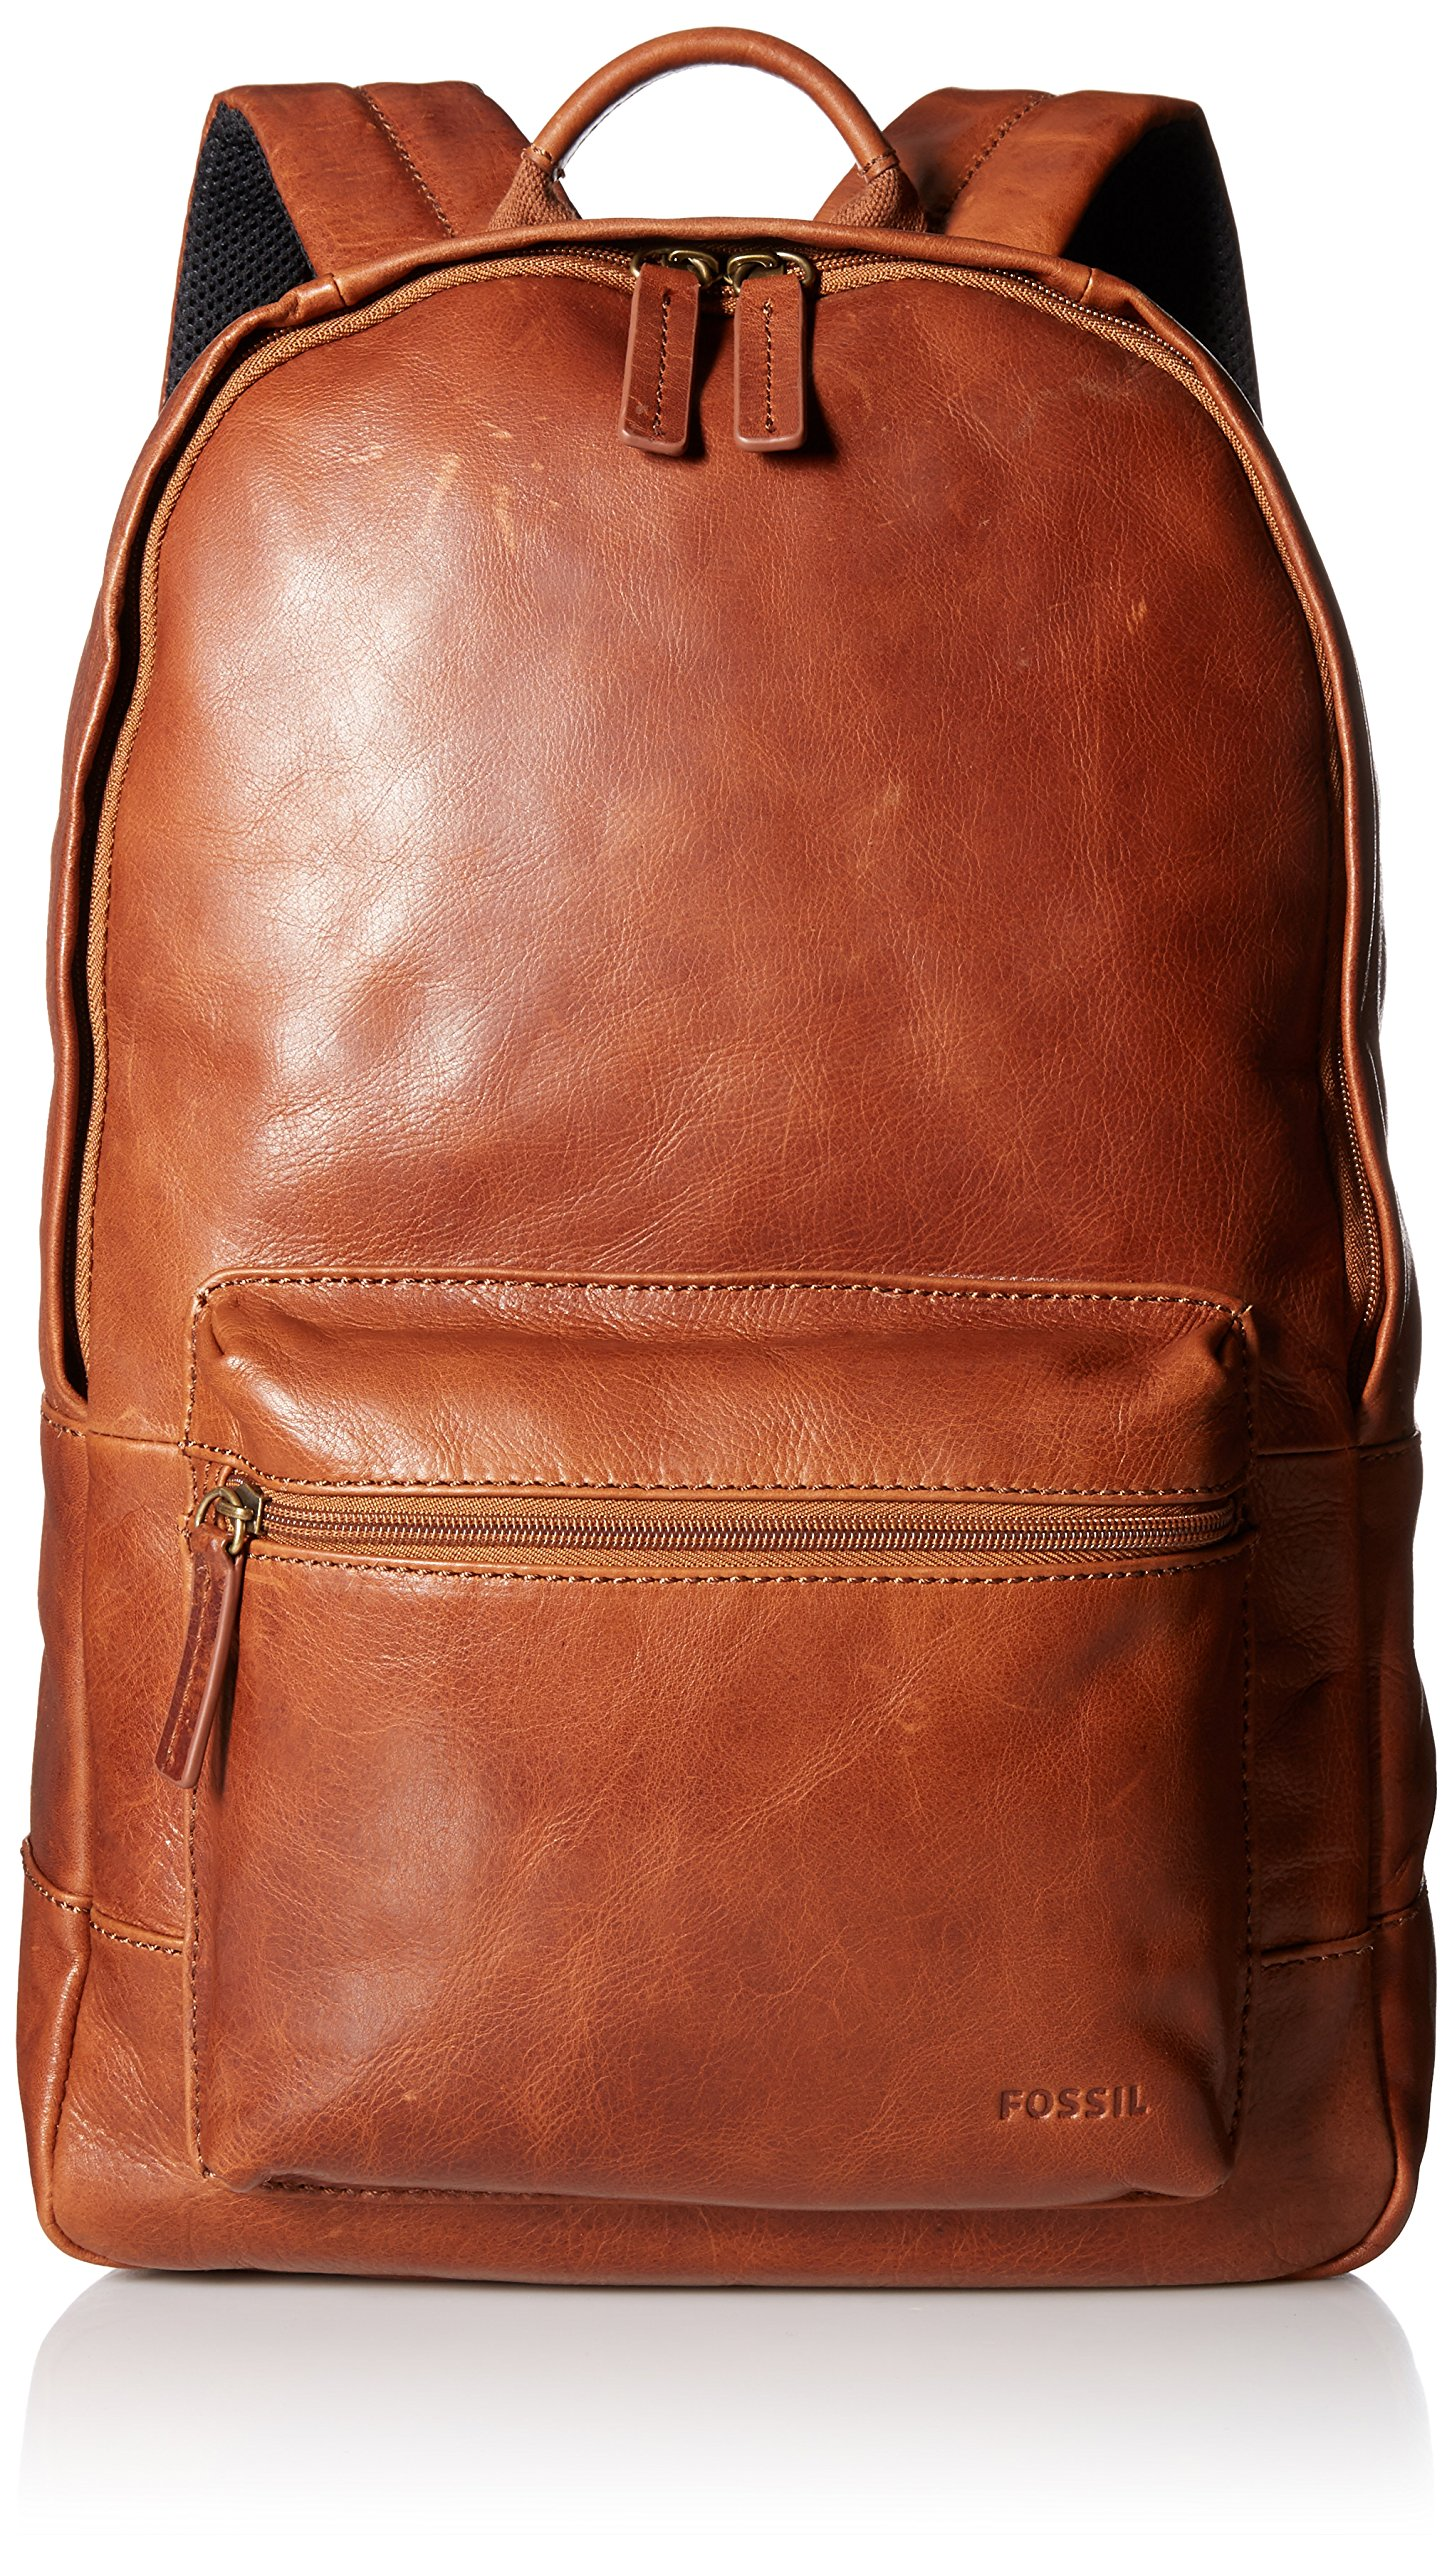 Fossil Men's Ledger Leather Backpack, Cognac, One Size